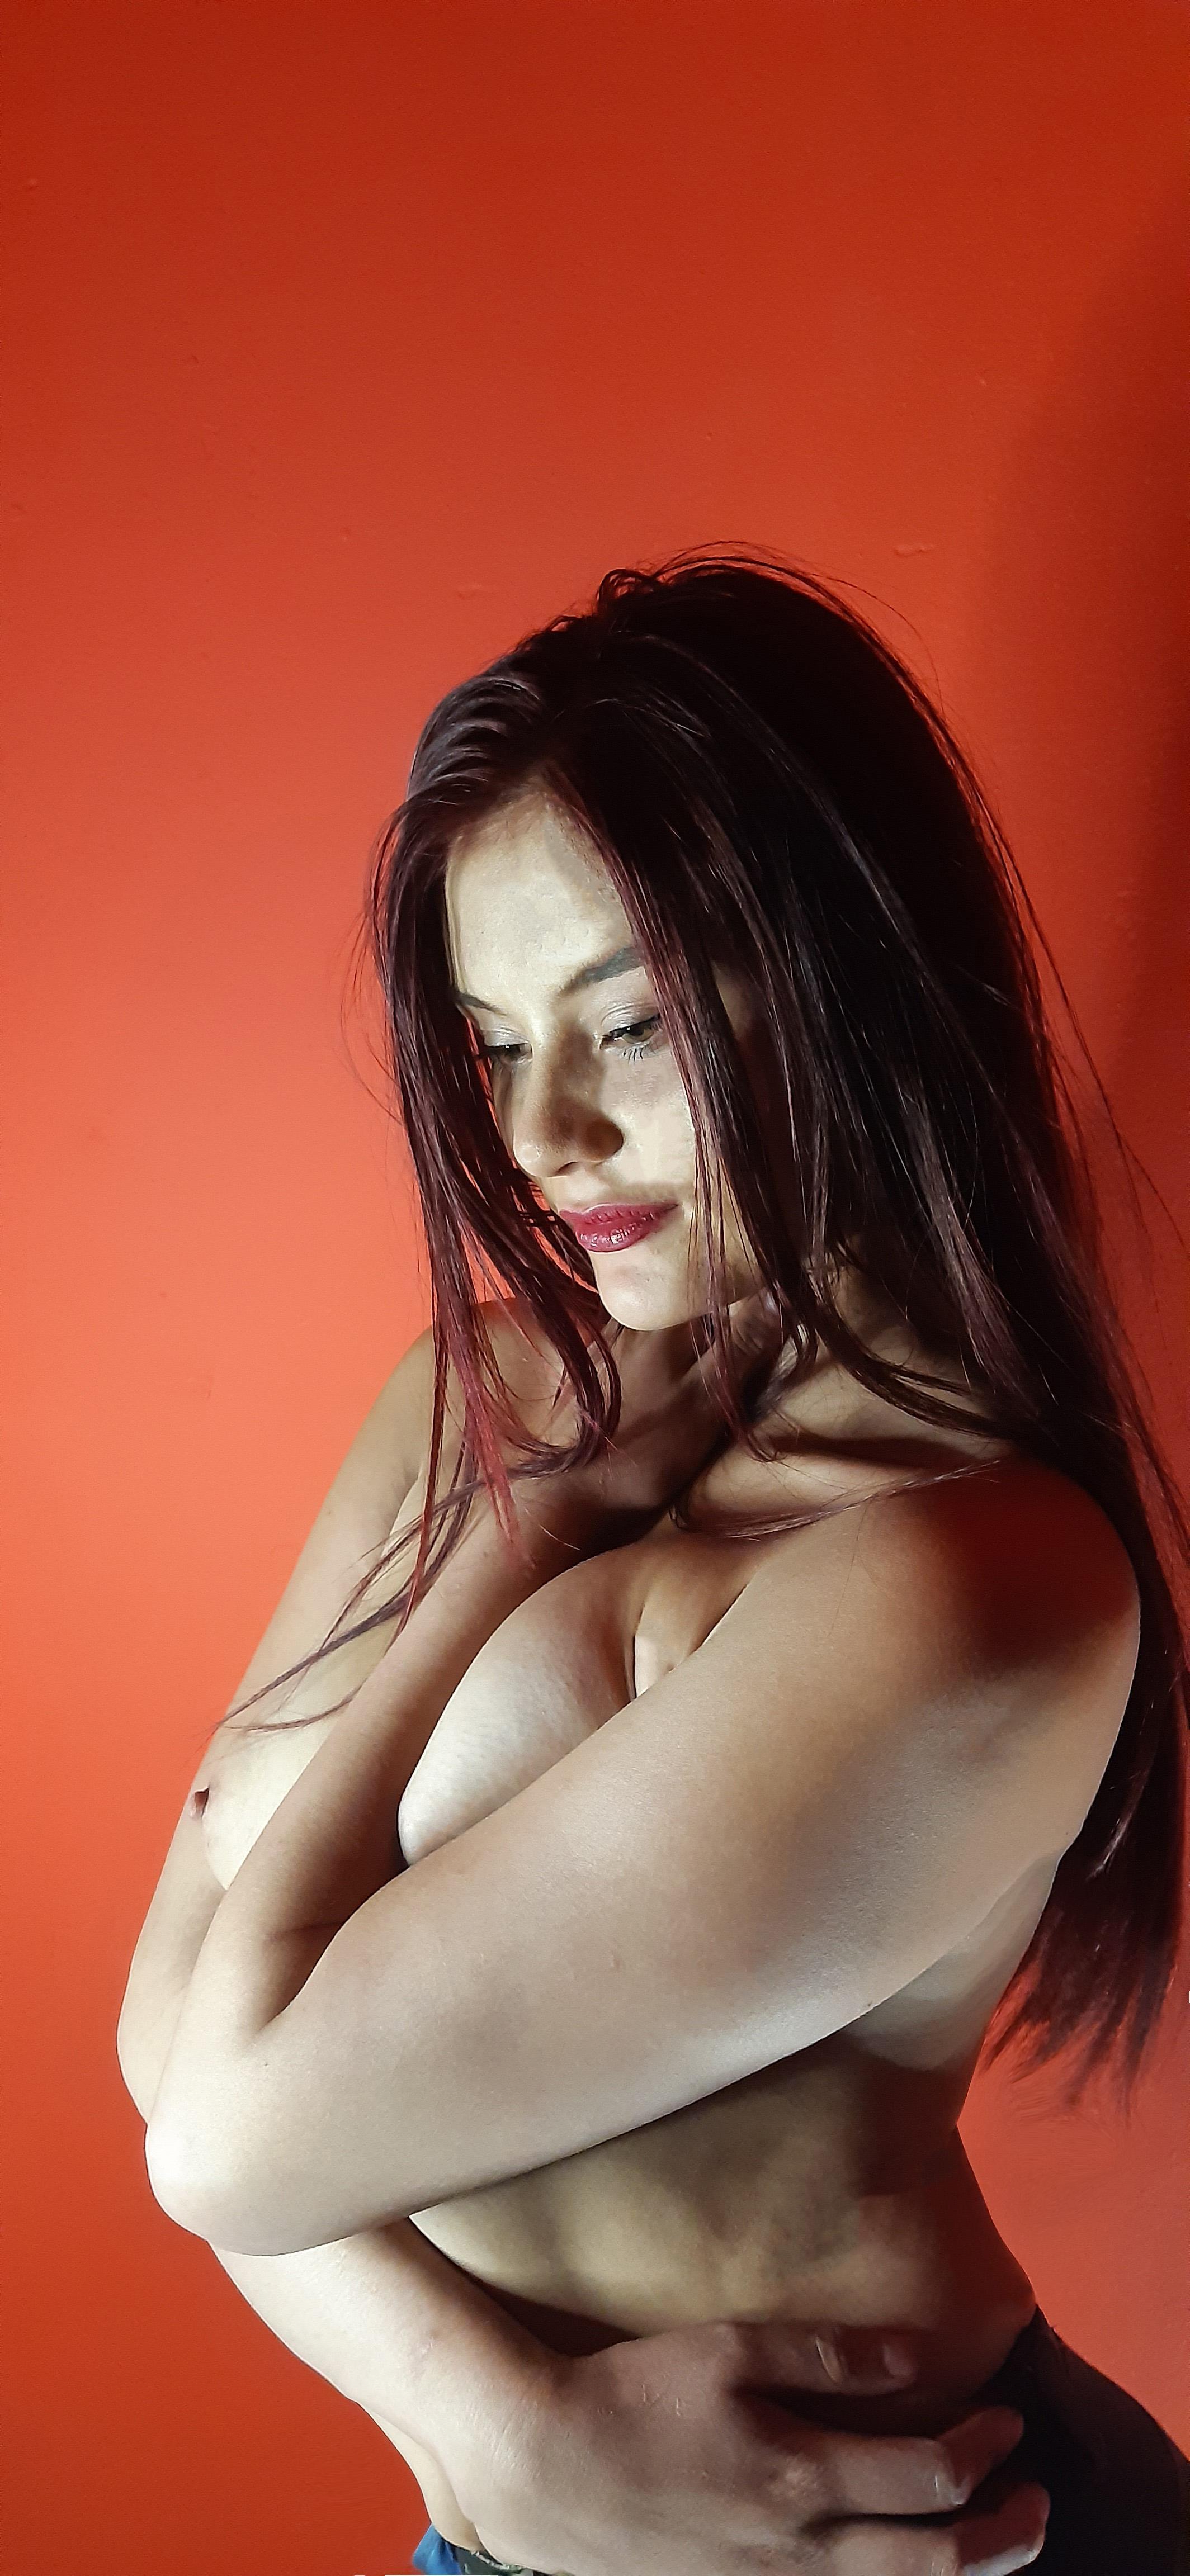 Nicole trevor?s=9233sq9juzf8xdryjon17u2iytpbbg3siu+pjz++2sa=